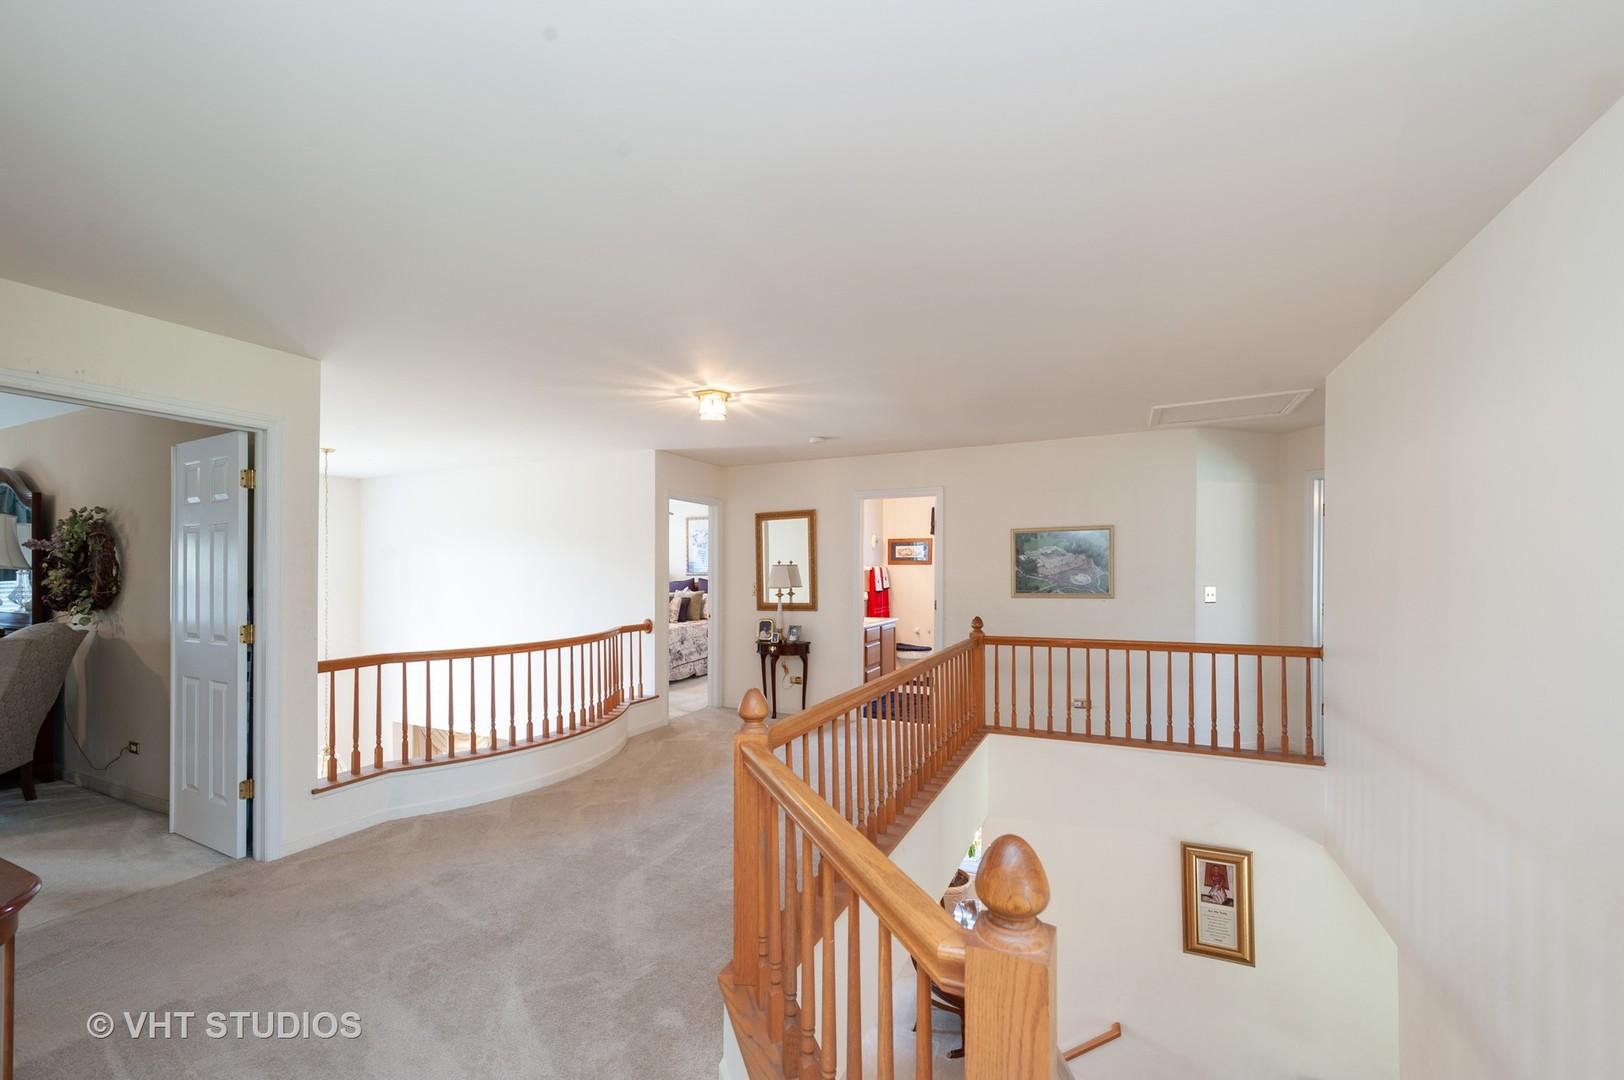 34032 North Wooded Glen, Grayslake, Illinois, 60030